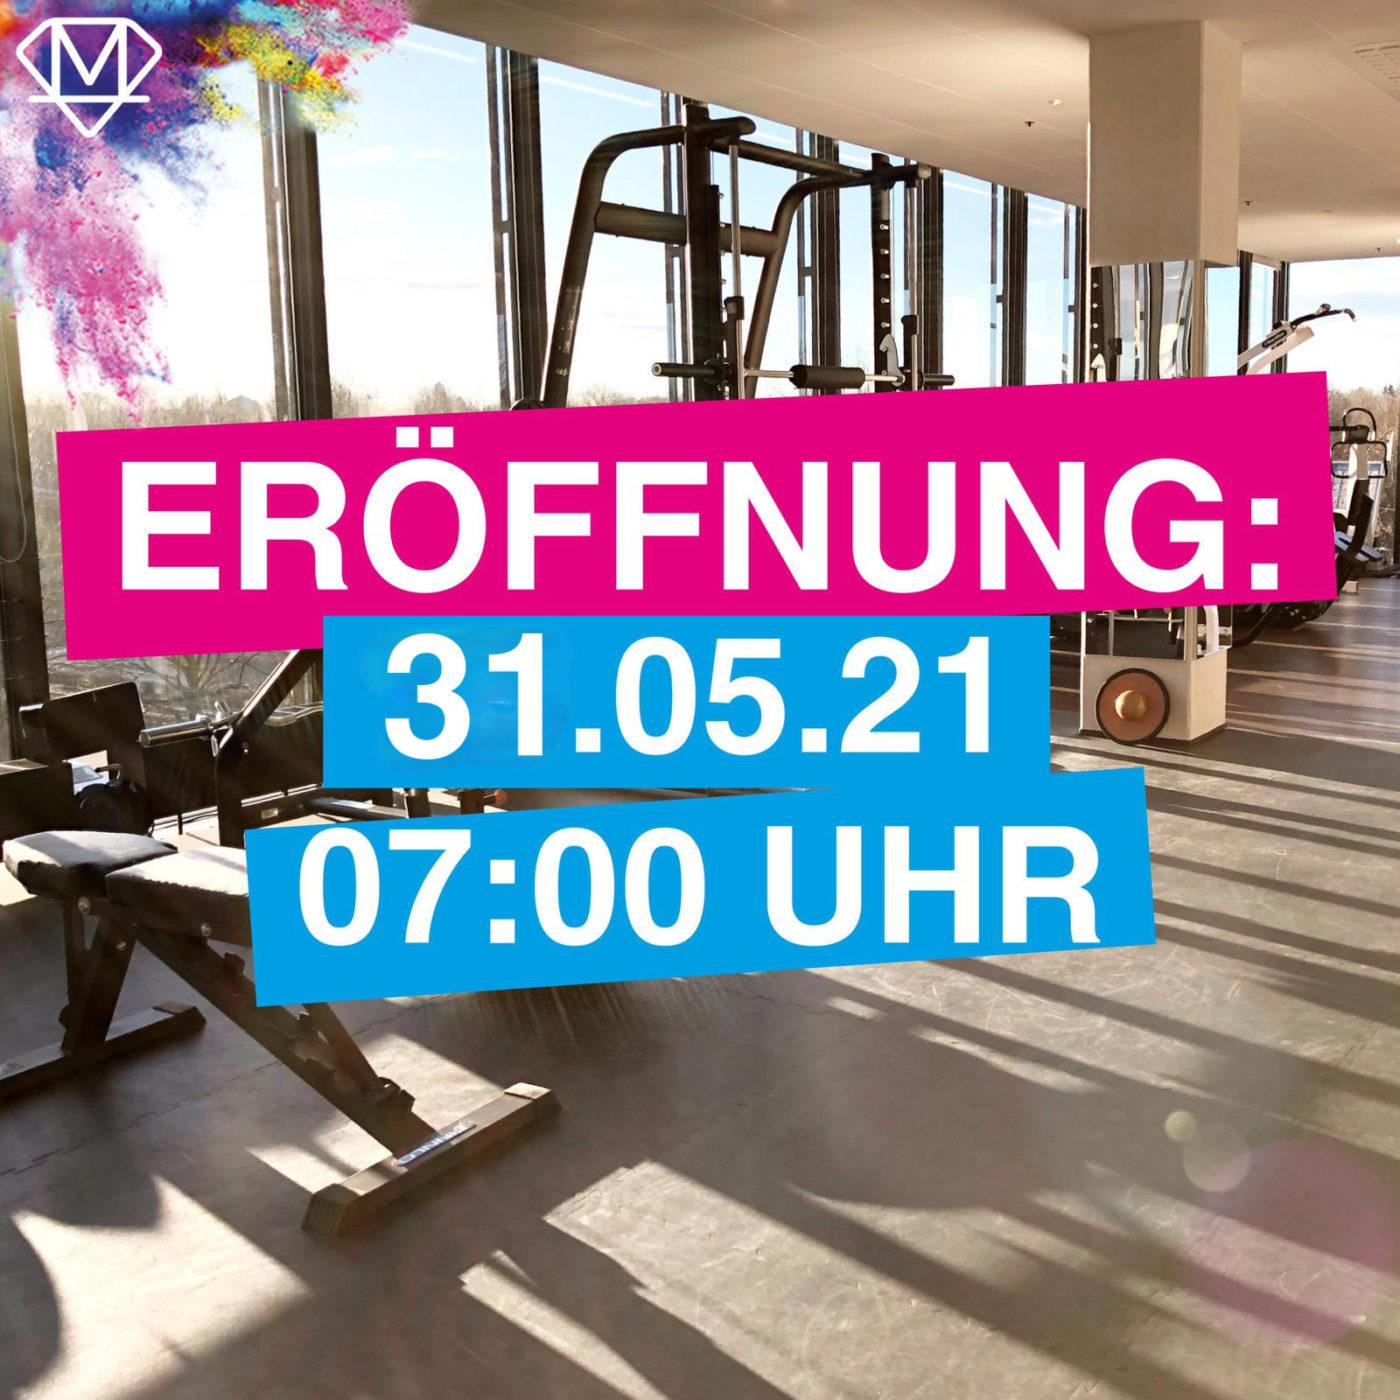 MOVEMENT FITNESS MÜNCHEN ERÖFFNUNG 1400x1400 - ERÖFFNUNG 31.05.21 - Alles Infos hier